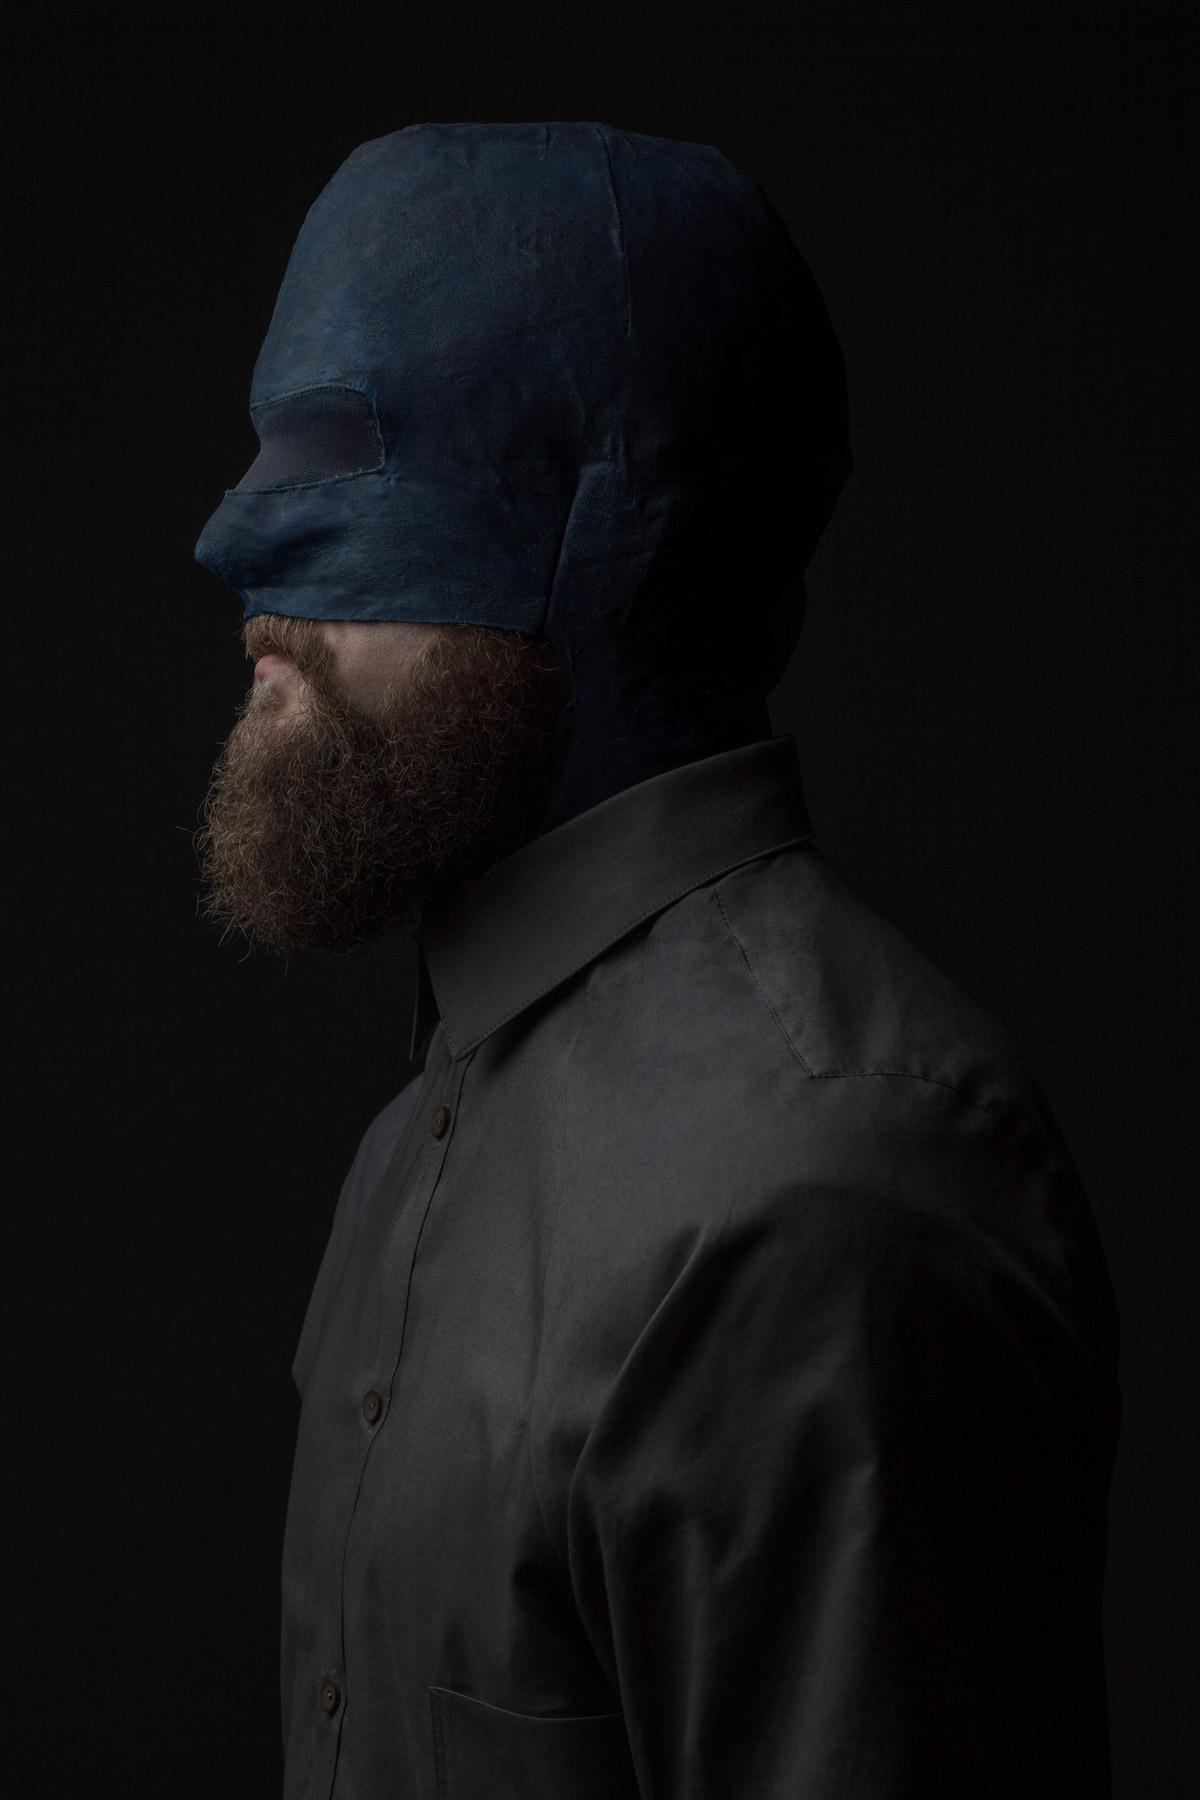 mode maske blau bart detail mann lukas fischer superior superhelden maske studio dunkel duster exoskelett jörn strojny